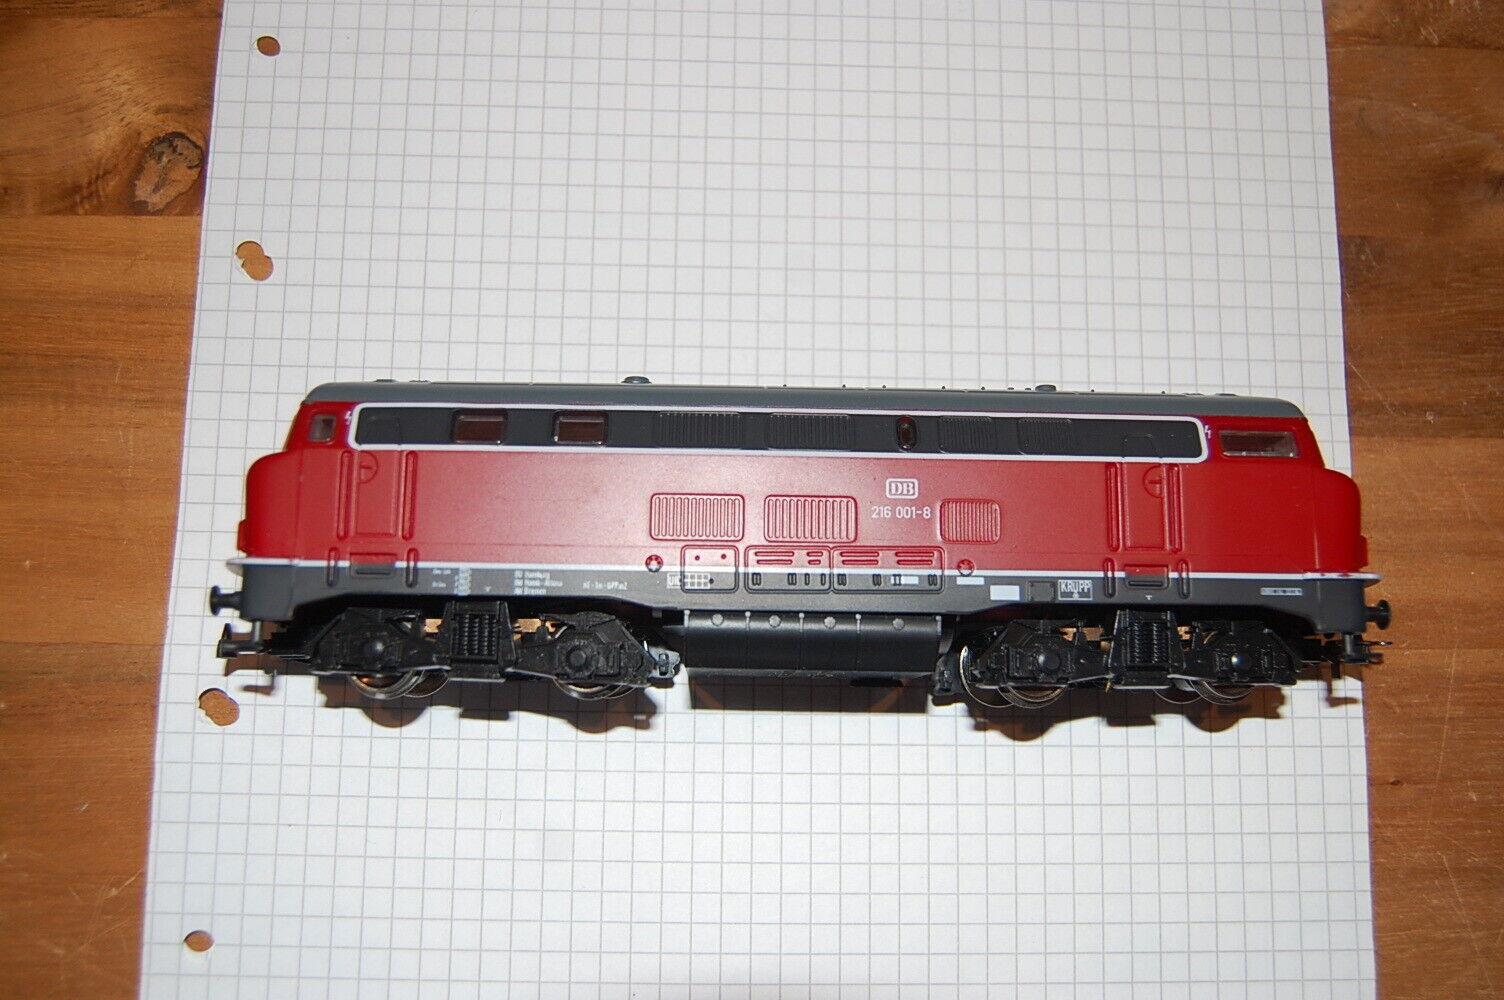 Mehano Modelbahn Spur HO Diesellokomotive DB BR 216 001-8